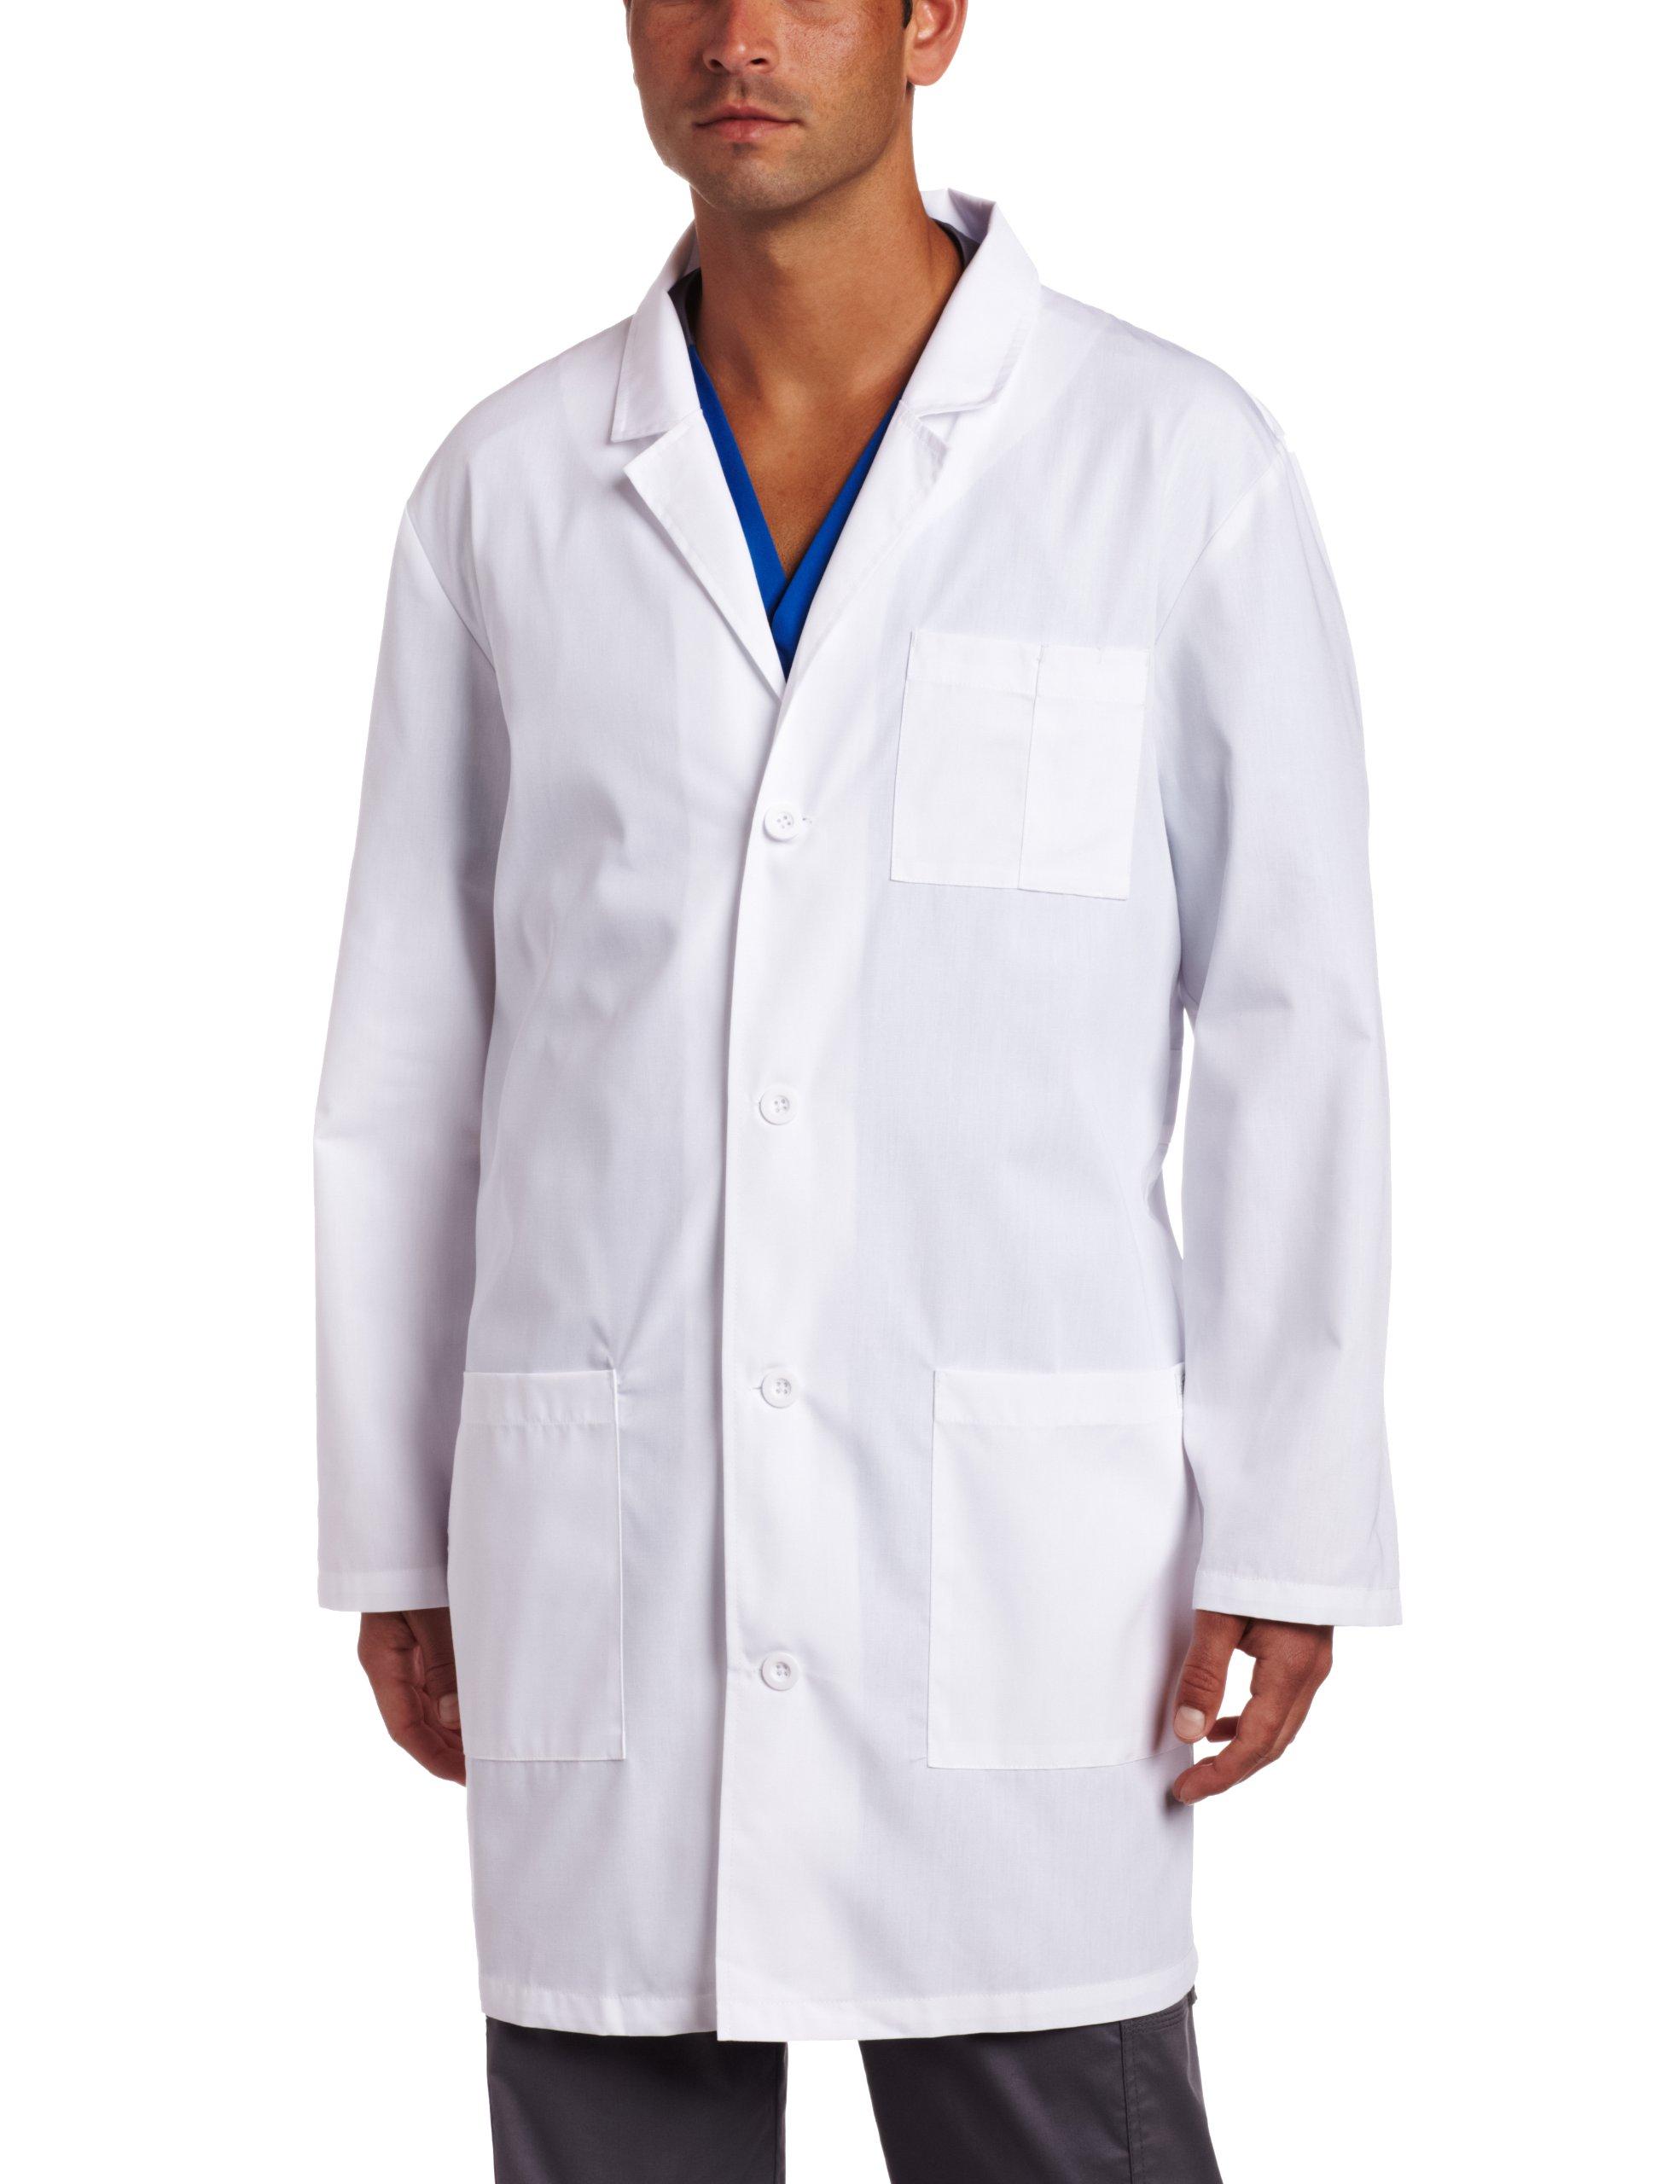 Dickies Everyday Scrubs Unisex 37 Inch Lab Coat,White,Medium